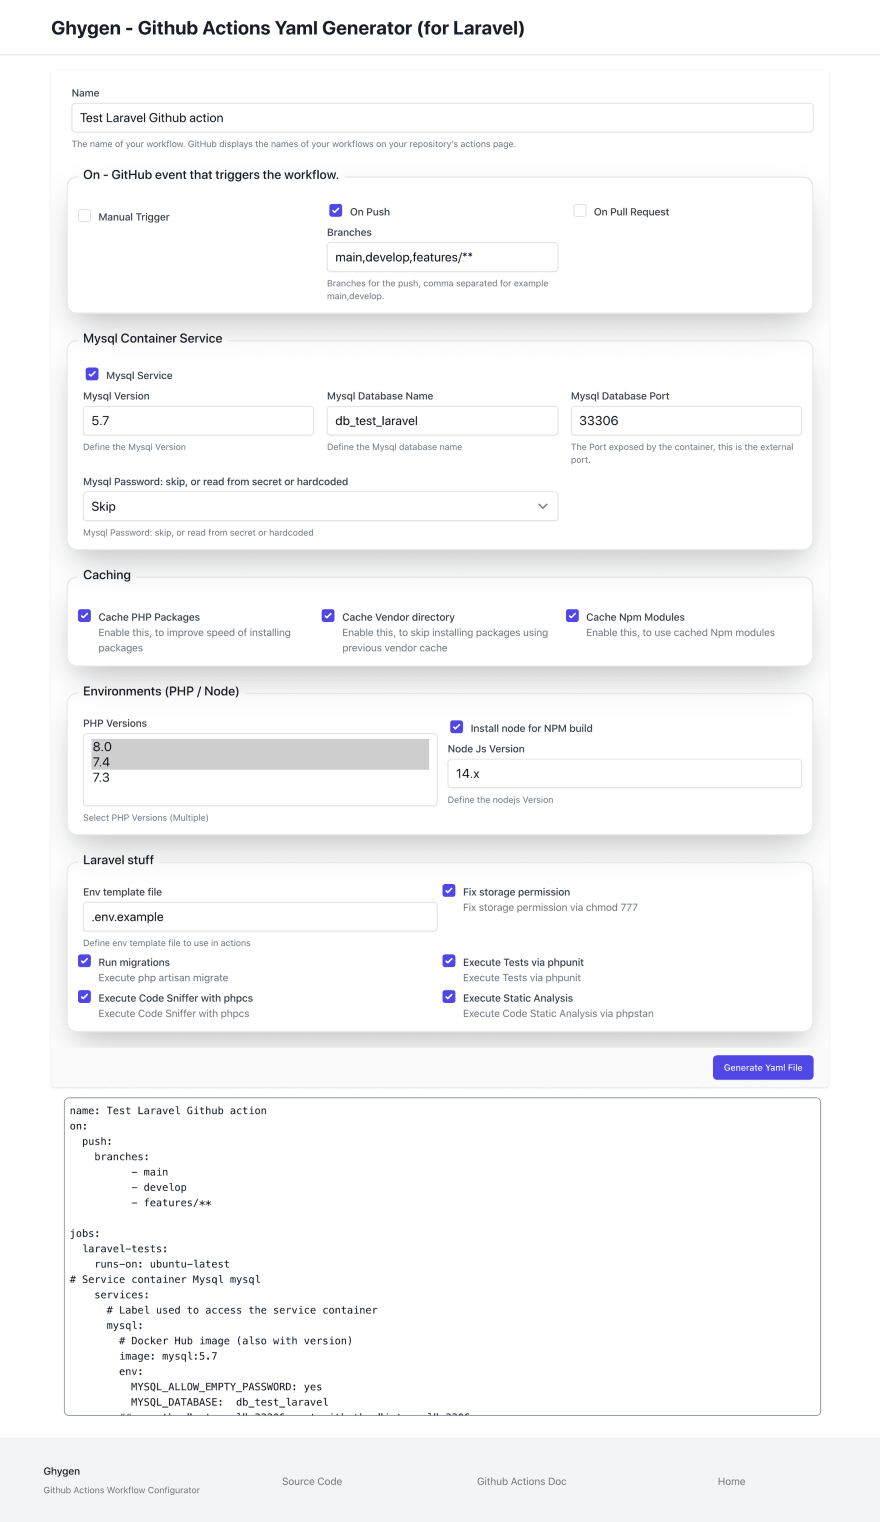 GHYGEN GitHub Actions Yaml Generator Screenshot